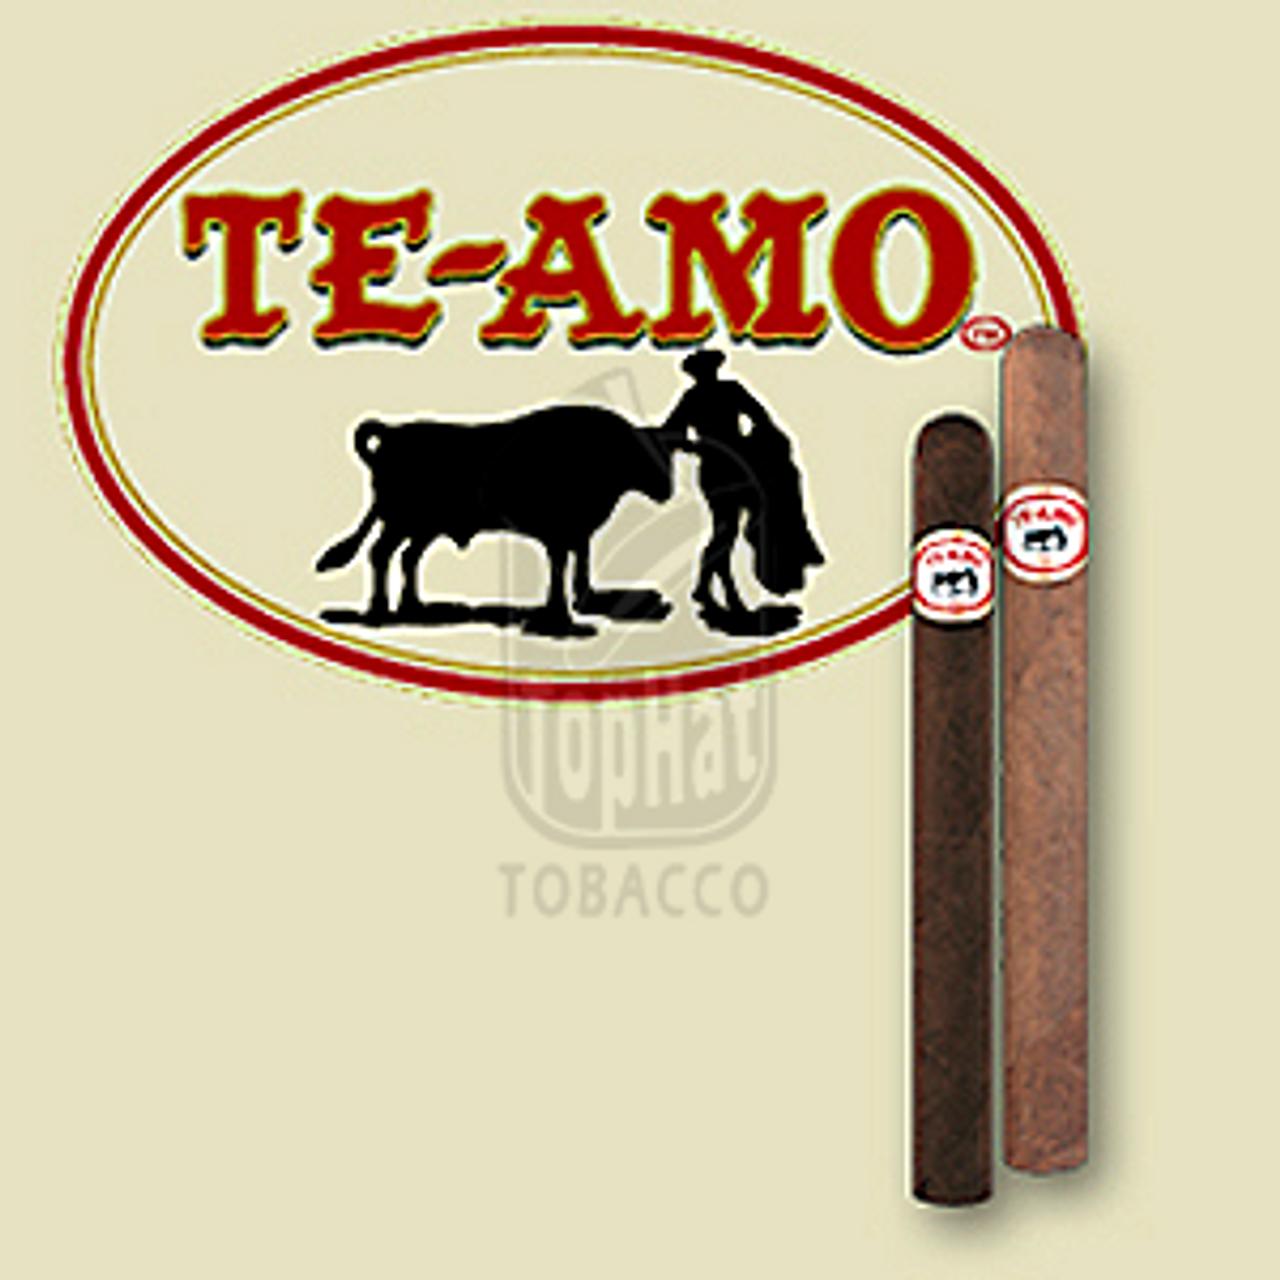 Te-Amo Robusto Natural Cigars - 5 1/2 x 54 (Box of 25)